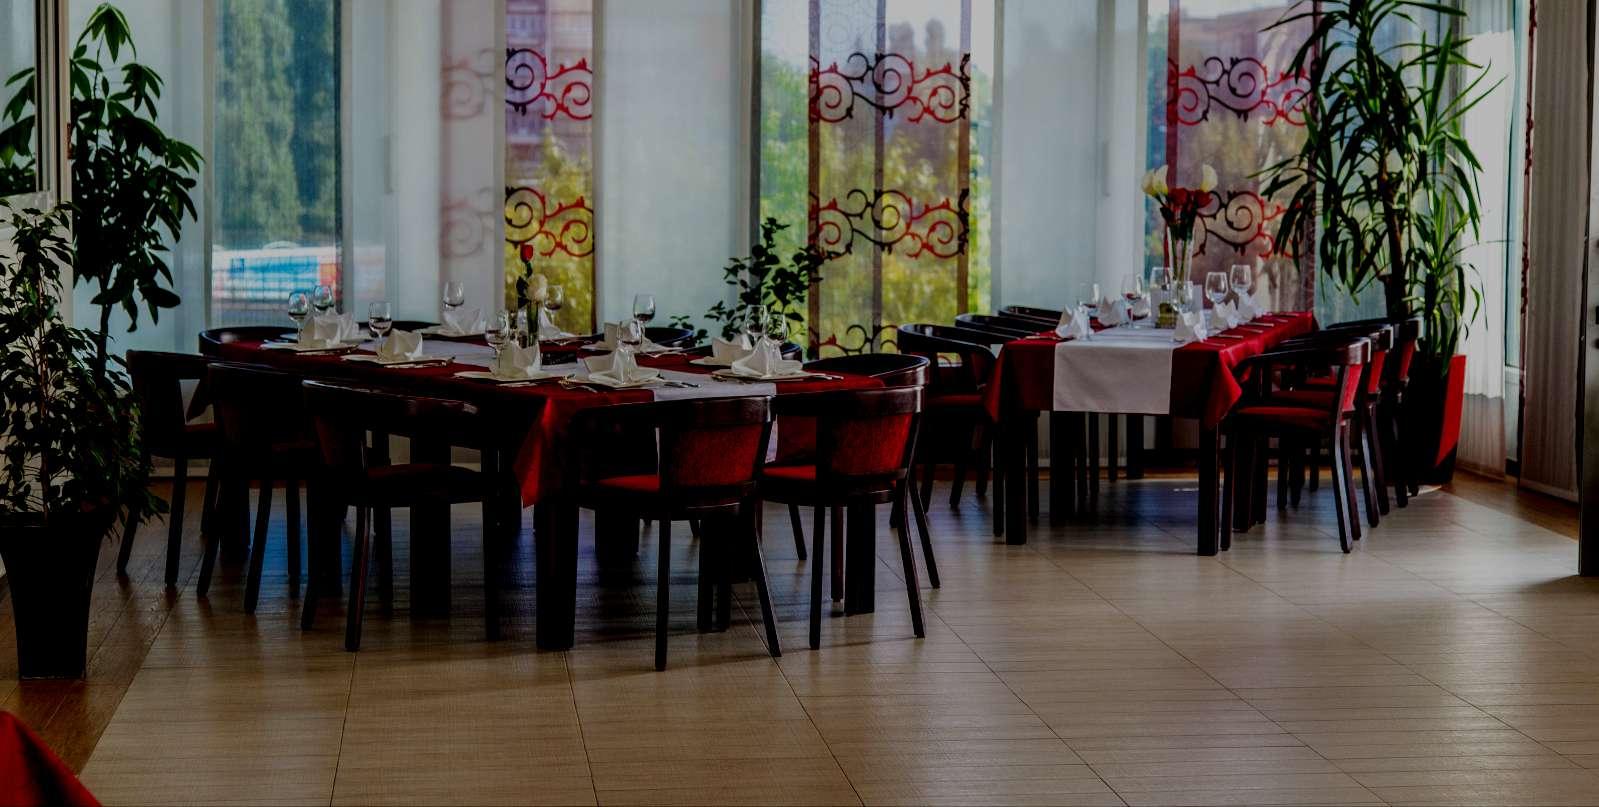 Restoran Panorama Restoran Panorama Restoran